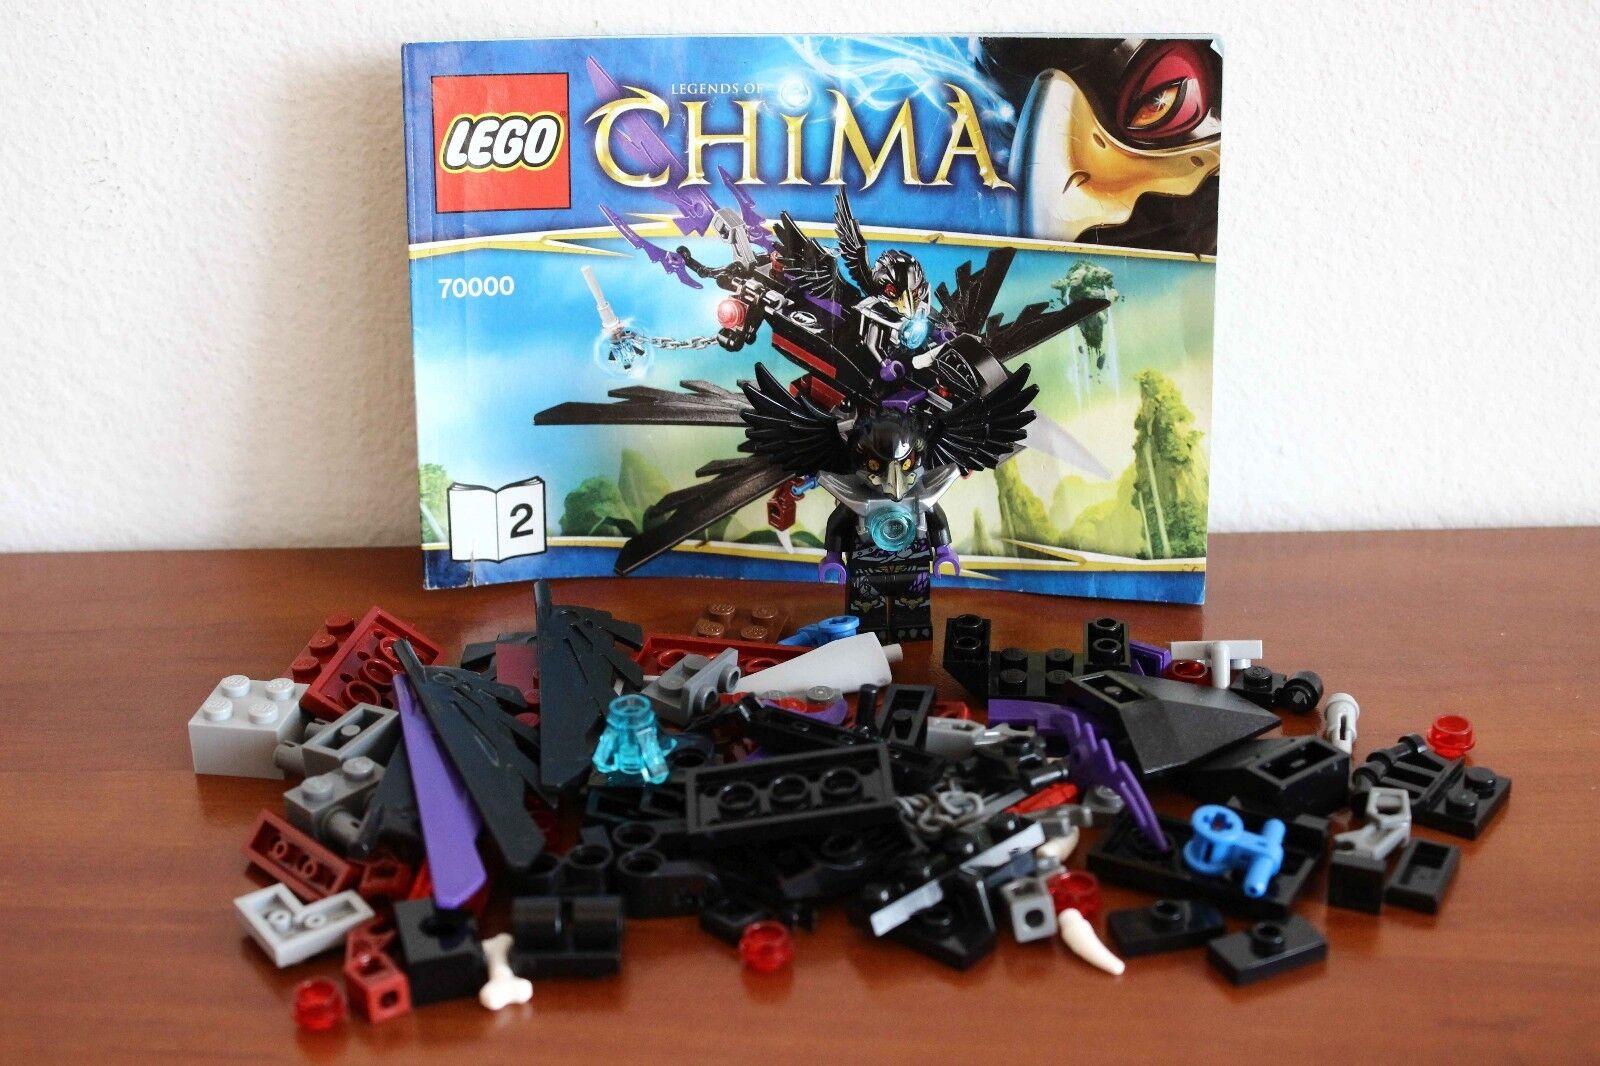 LEGO LEGENDS OF CHIMA RAZCAL/'S GLIDER MINIFIGURE SET 70000 *BRAND NEW SEALED*